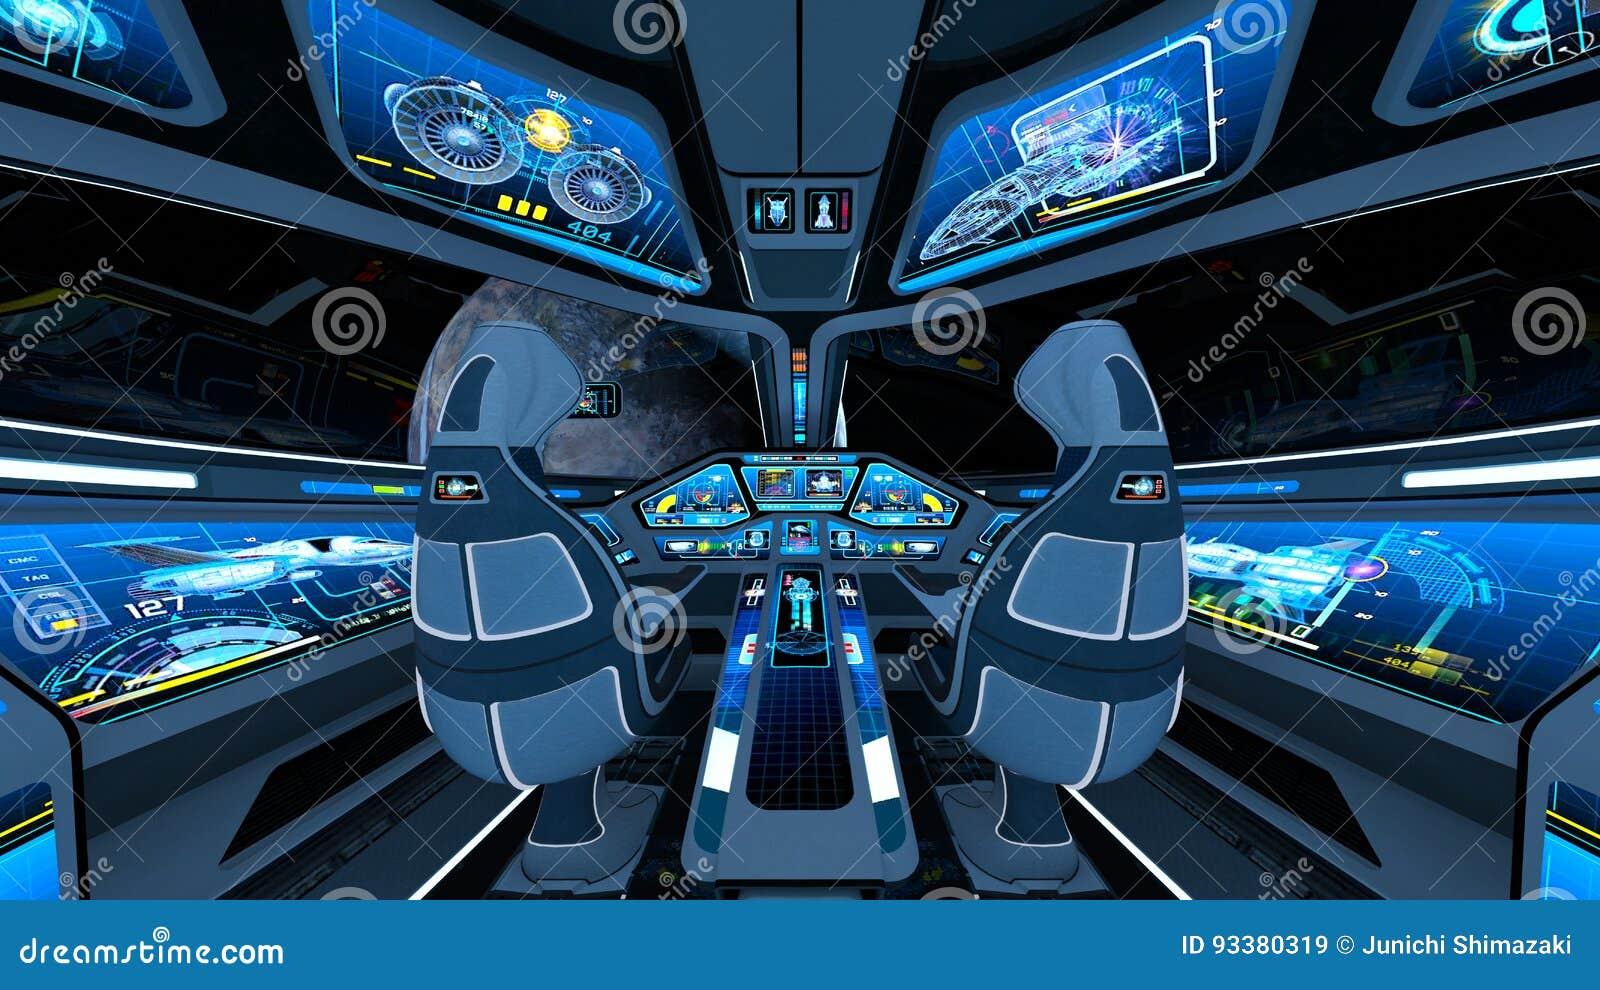 Space ship cockpit stock illustration  Illustration of high - 93380319